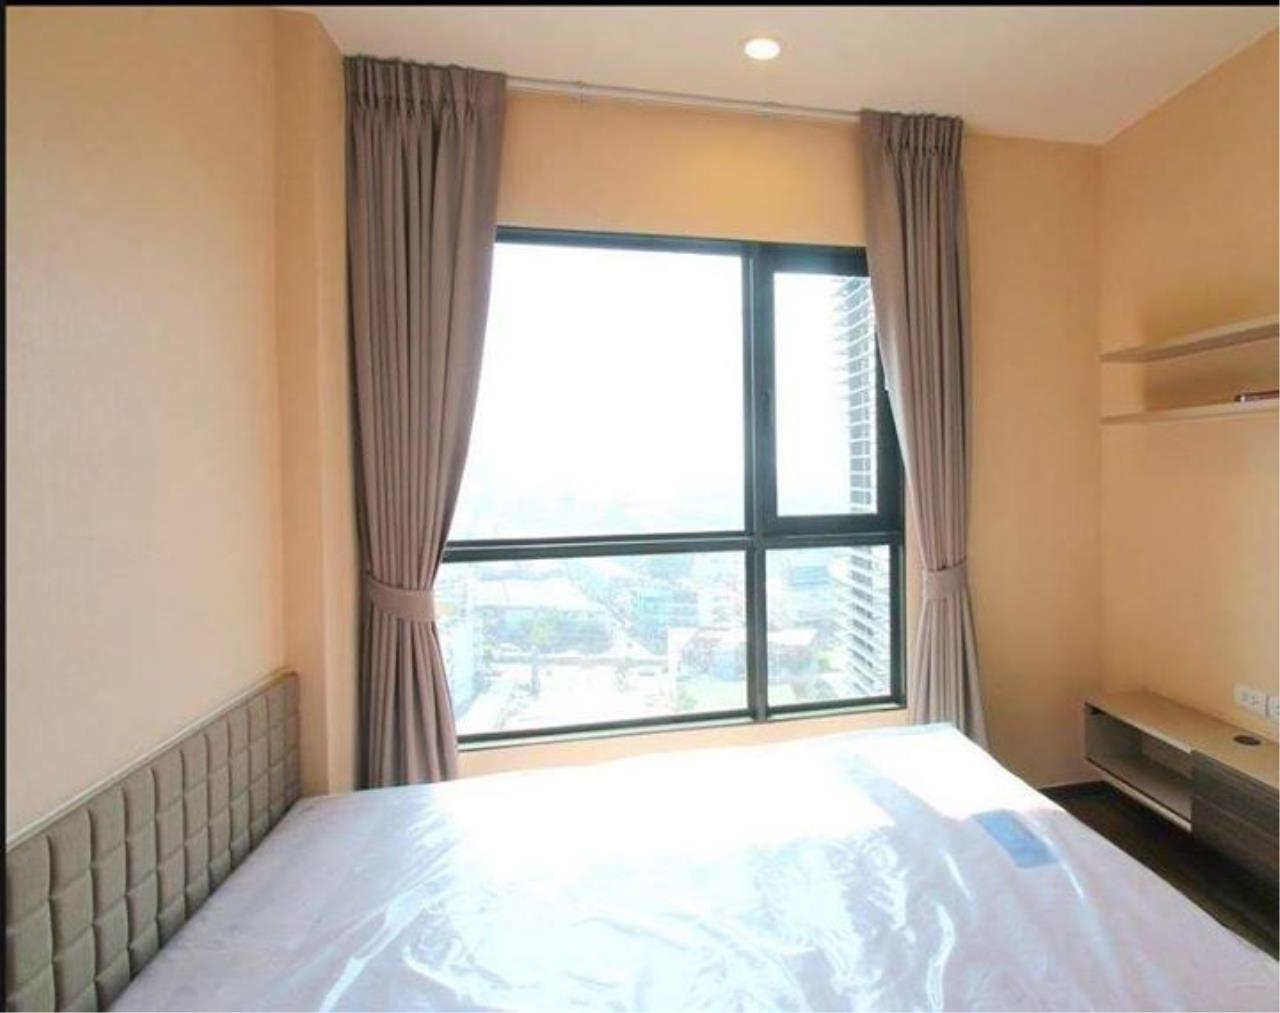 Century21 Skylux Agency's TEAL Sathorn-Taksin / Condo For Sale / 1 Bedroom / 30.59 SQM / BTS Wongwian Yai / Bangkok 3